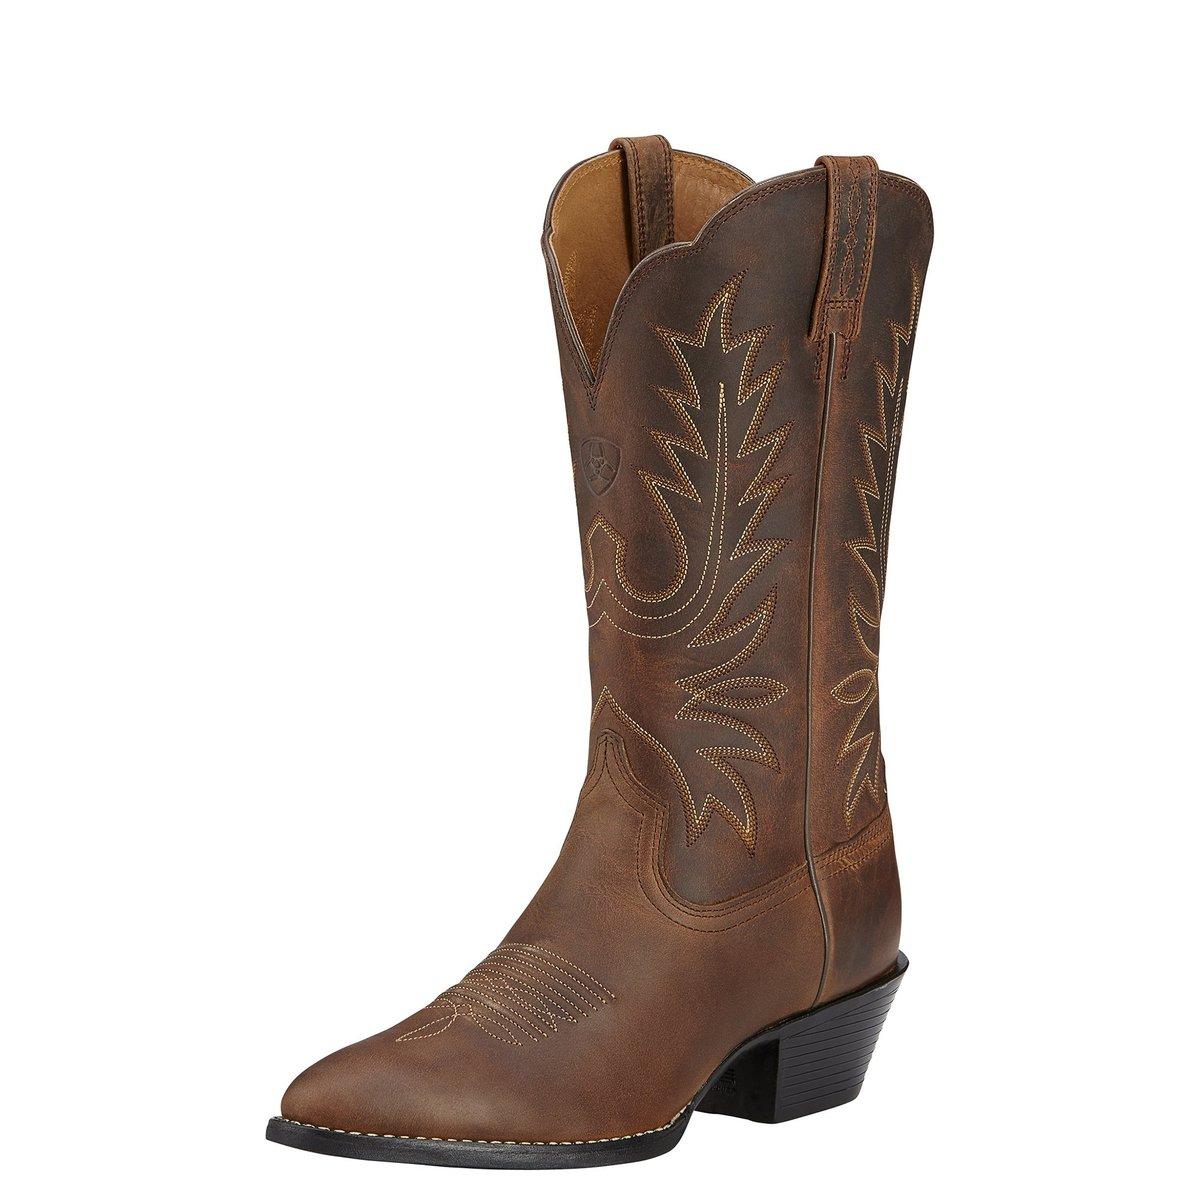 Heritage Western R Toe Women's Boot Distressed Brown 8.5 at Bowral Coop